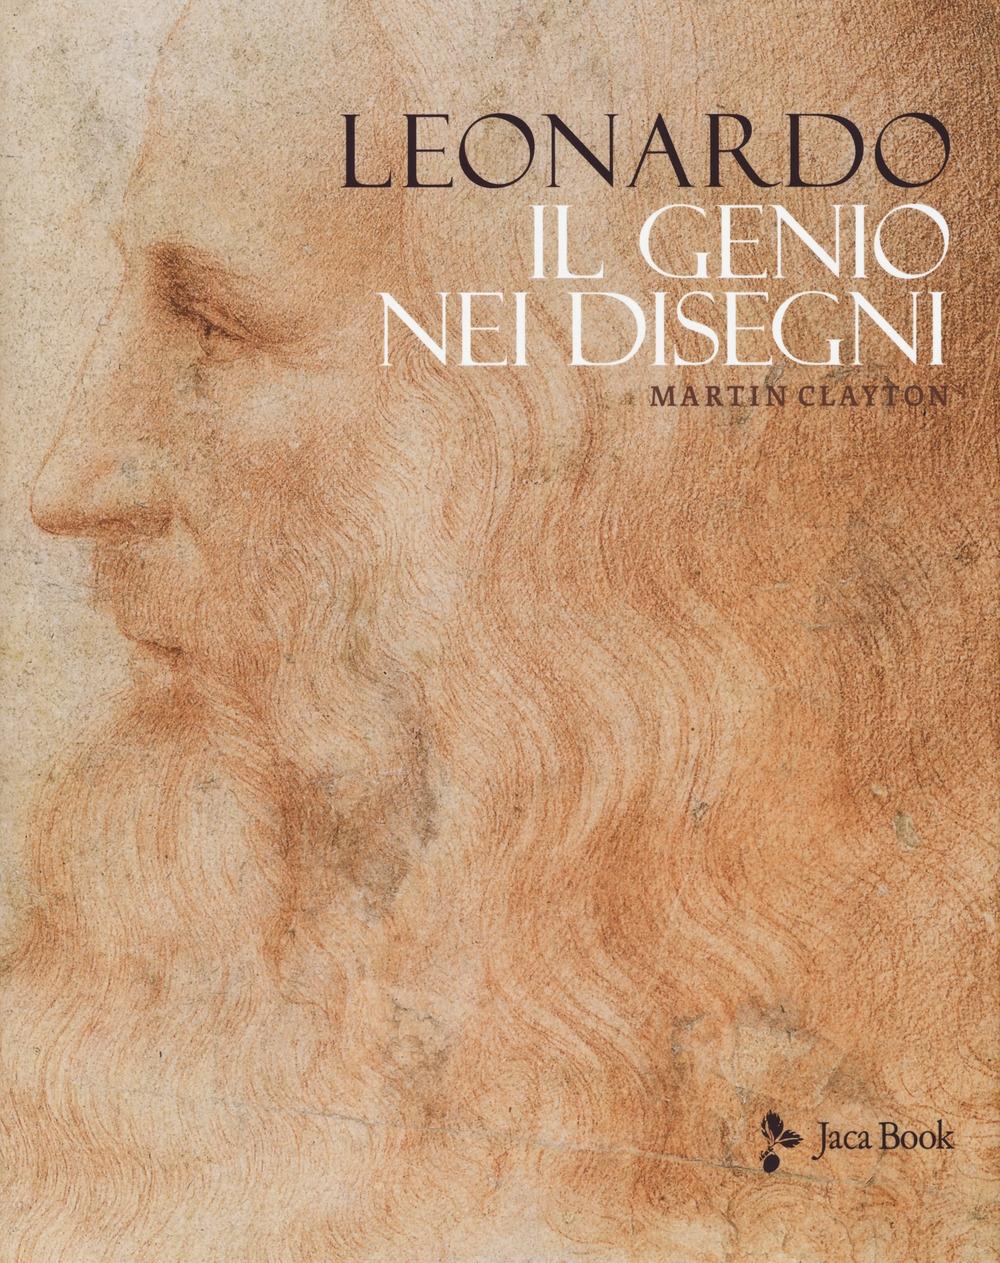 Leonardo. Il genio nei disegni